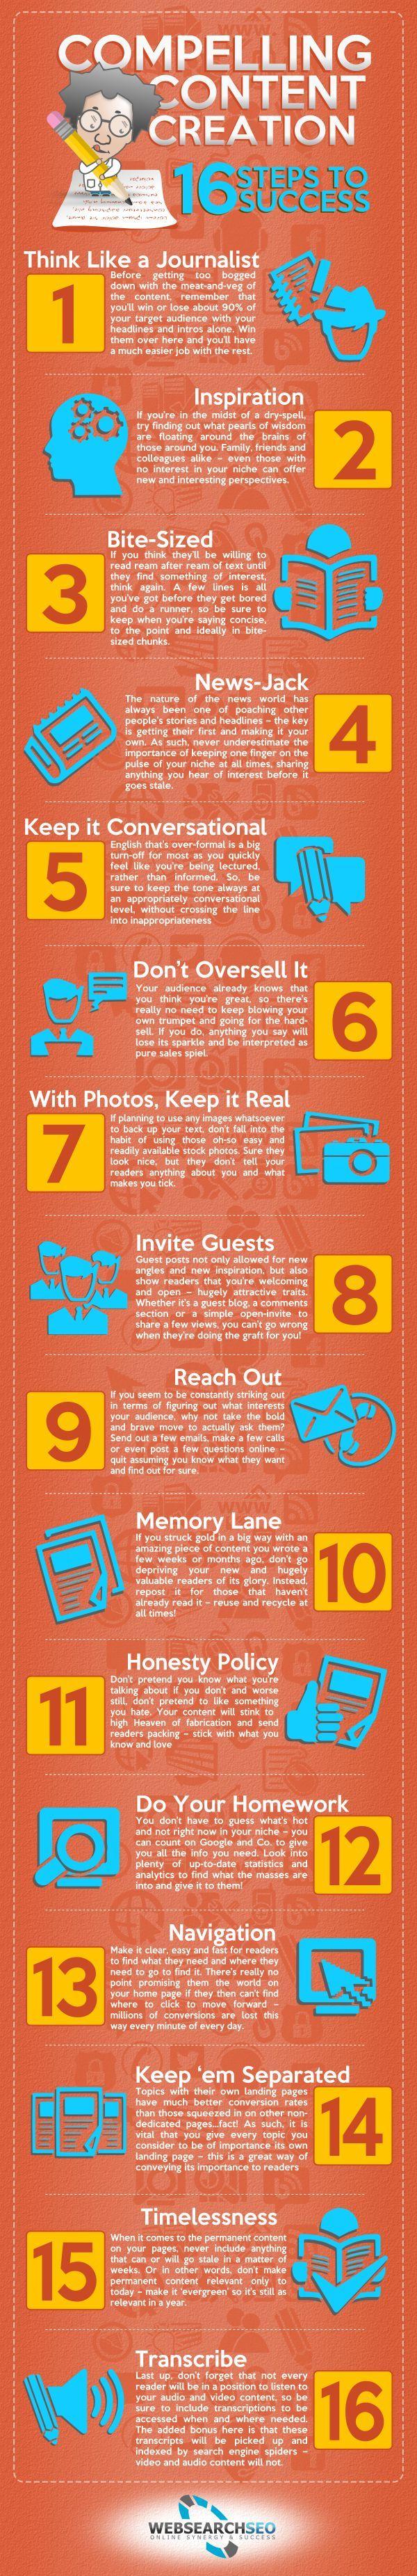 16 steps to successful content #marketing #success #Infographic www.socialmediamamma.com